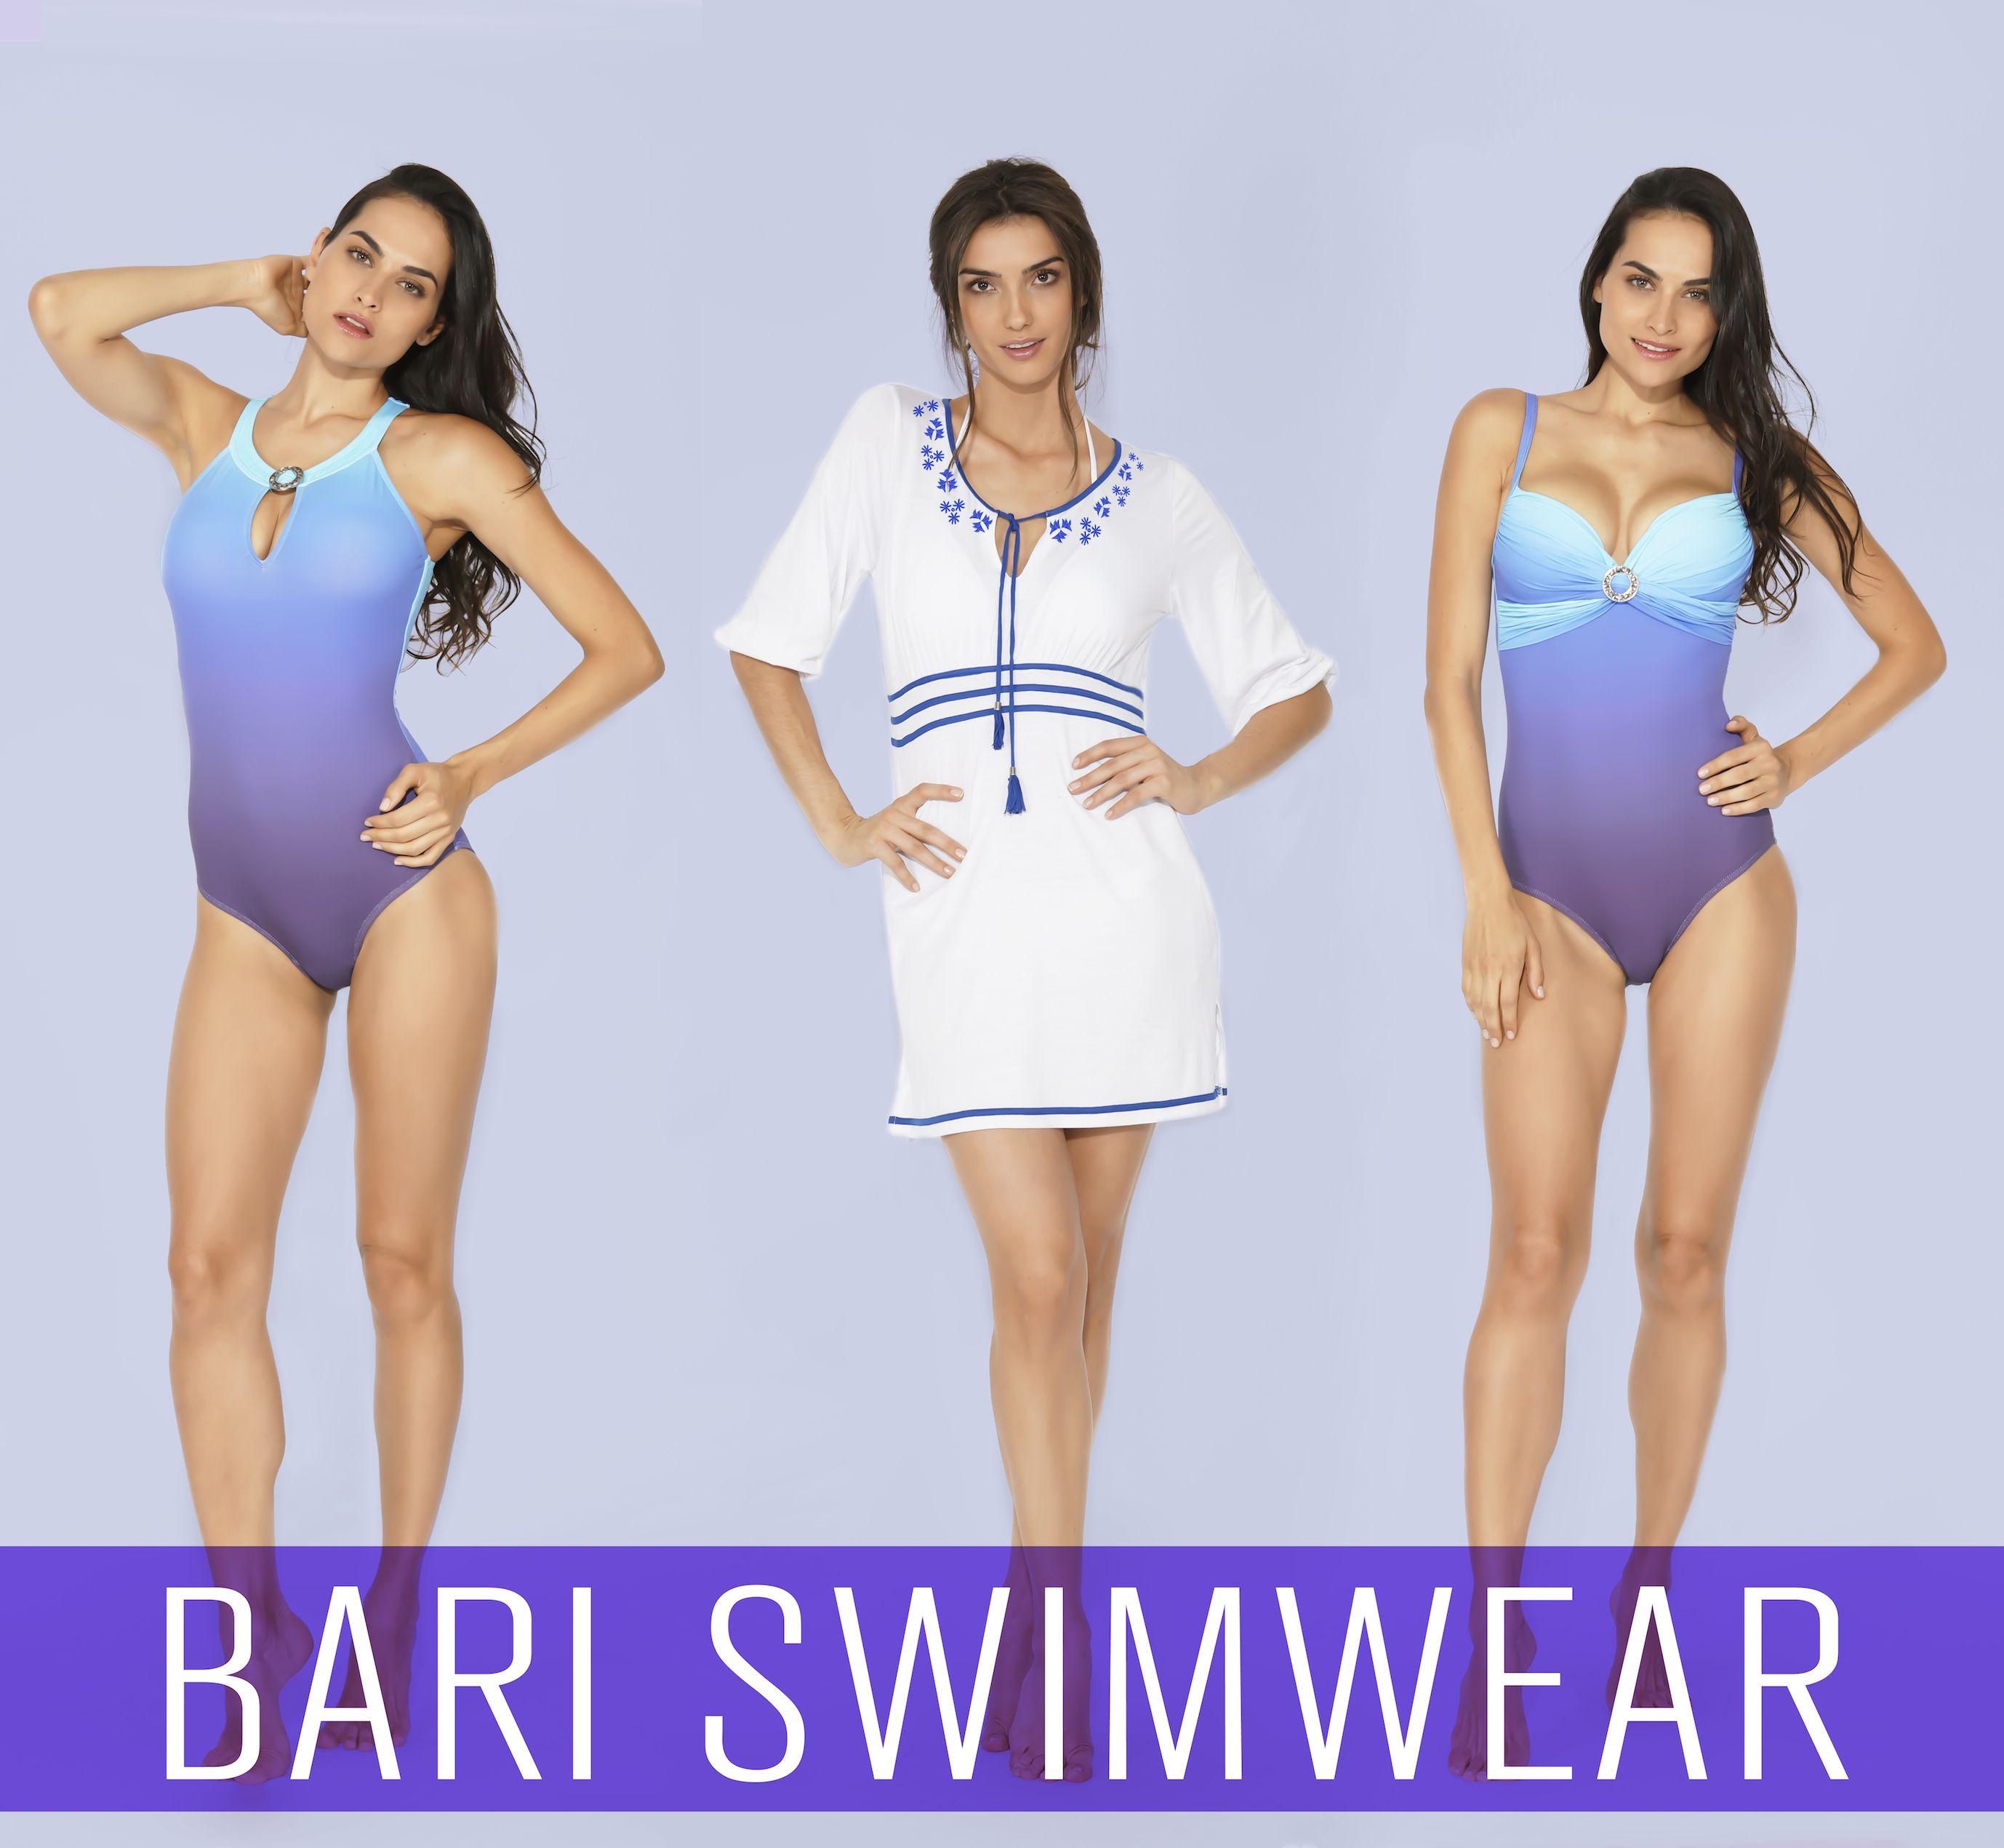 6cd559a1df51 Trajes de baño completos en Bari Swimwear #azul #morado #swimwear ...